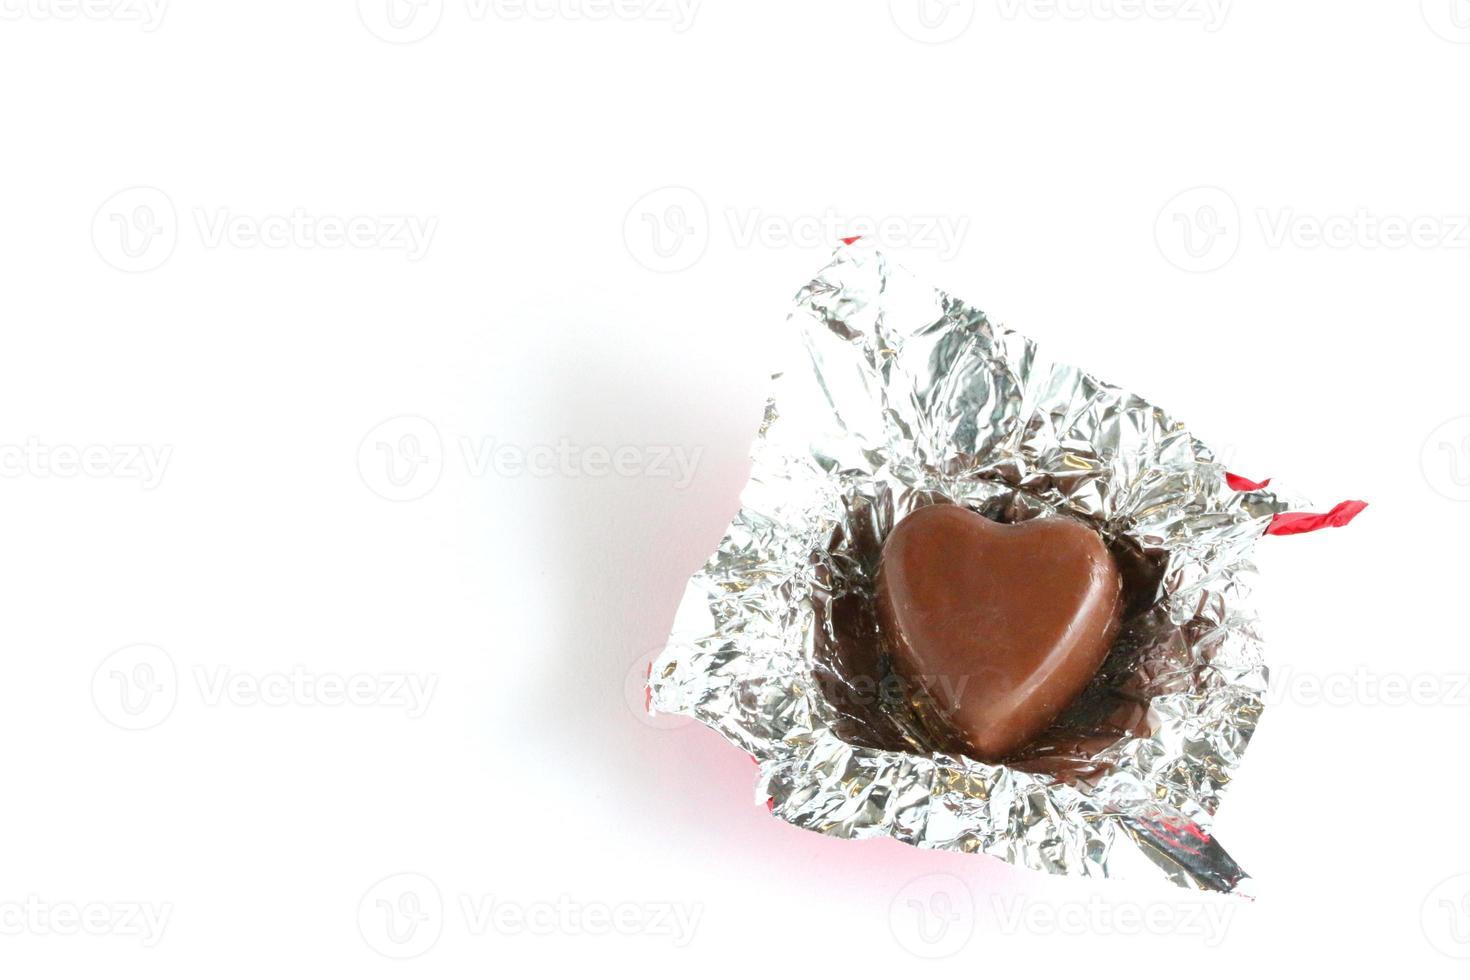 Heart Shaped Chocolate photo